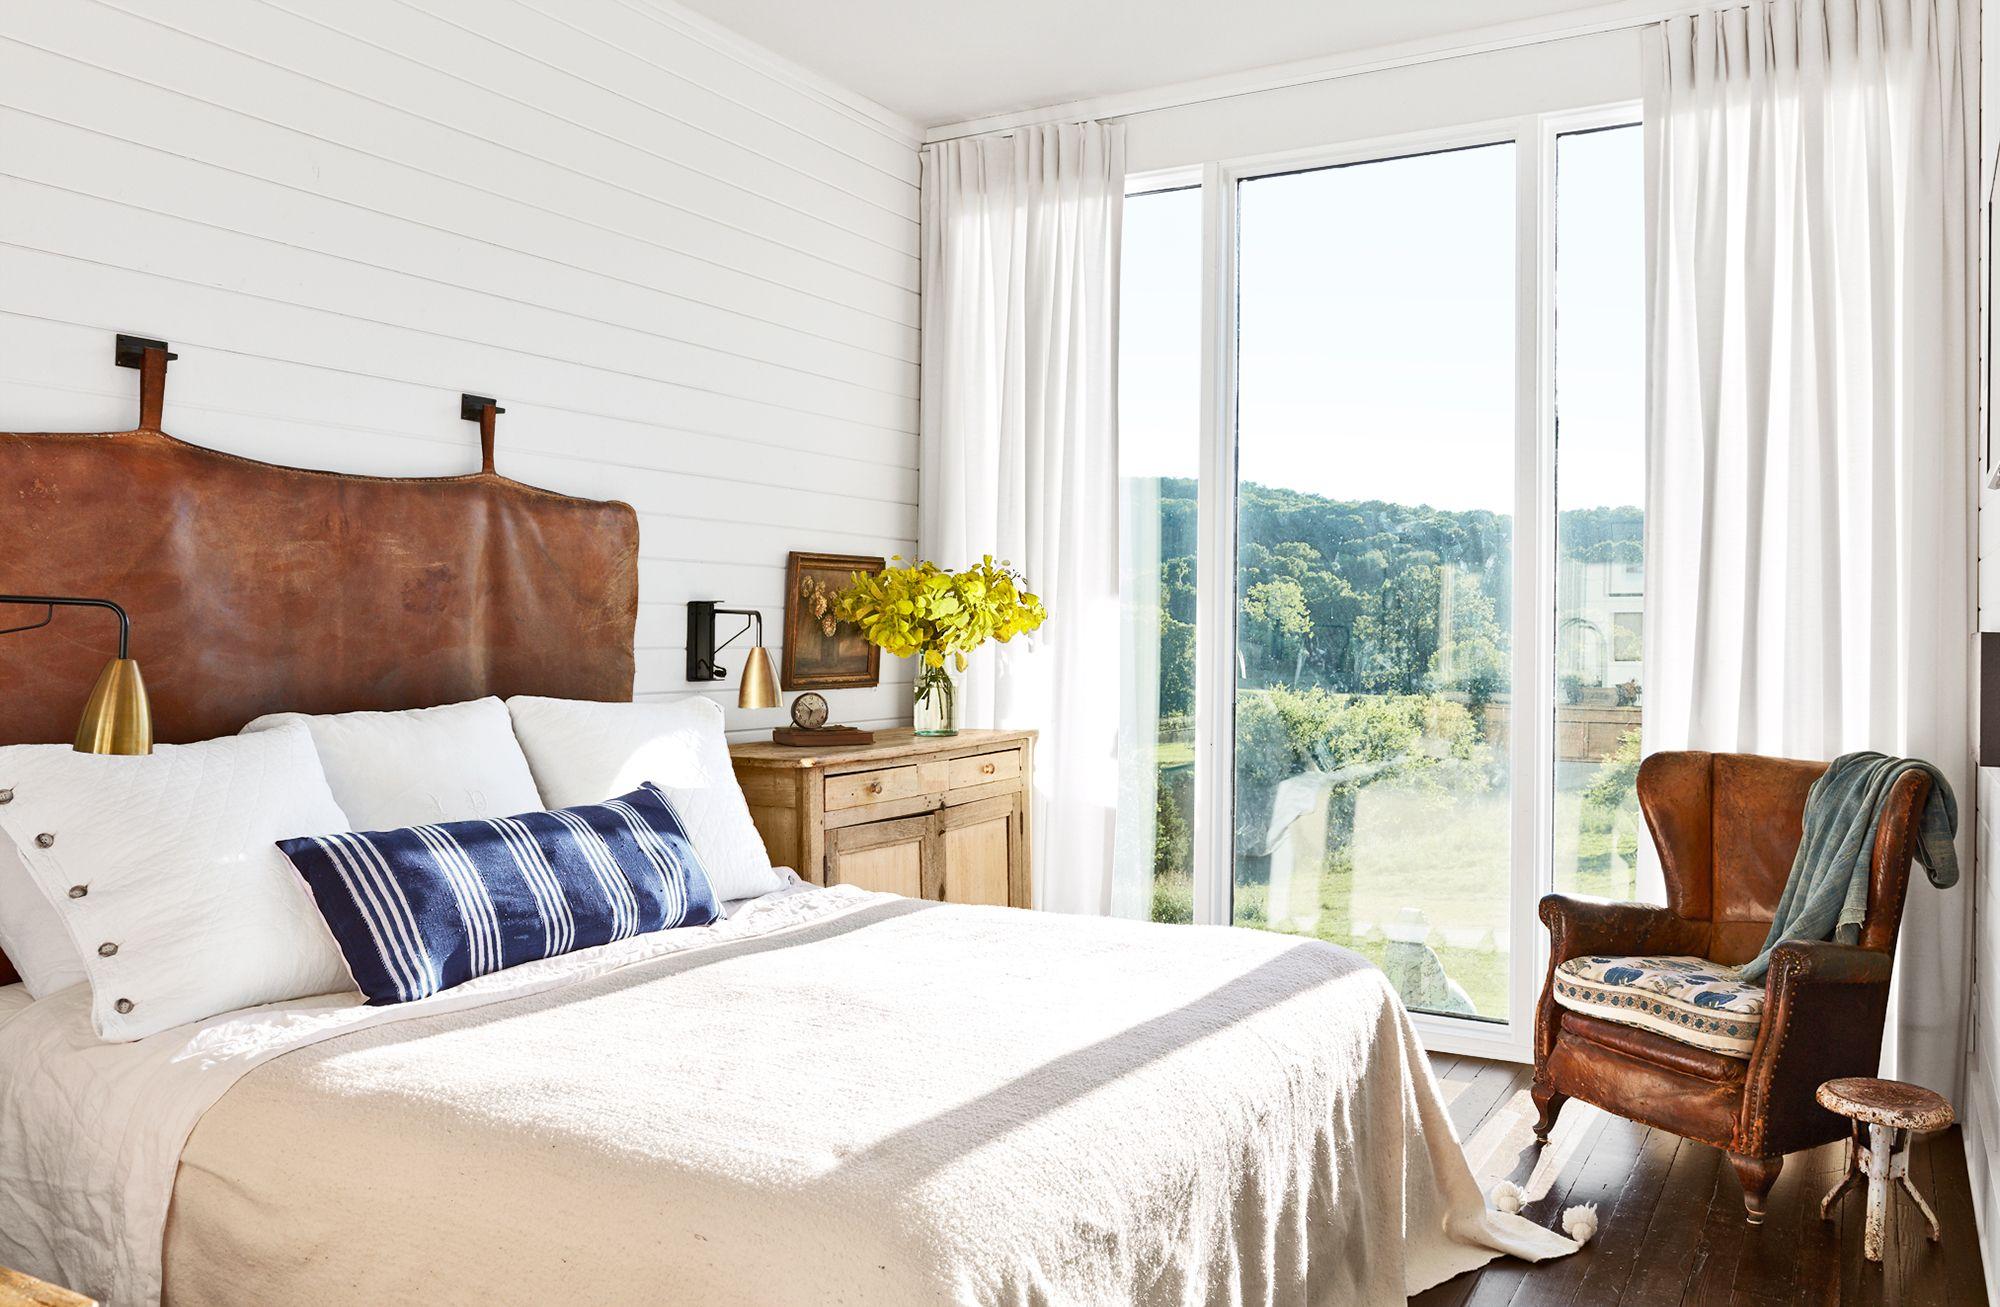 26 Best Shabby Chic Bedrooms - Modern Shabby Chic ...